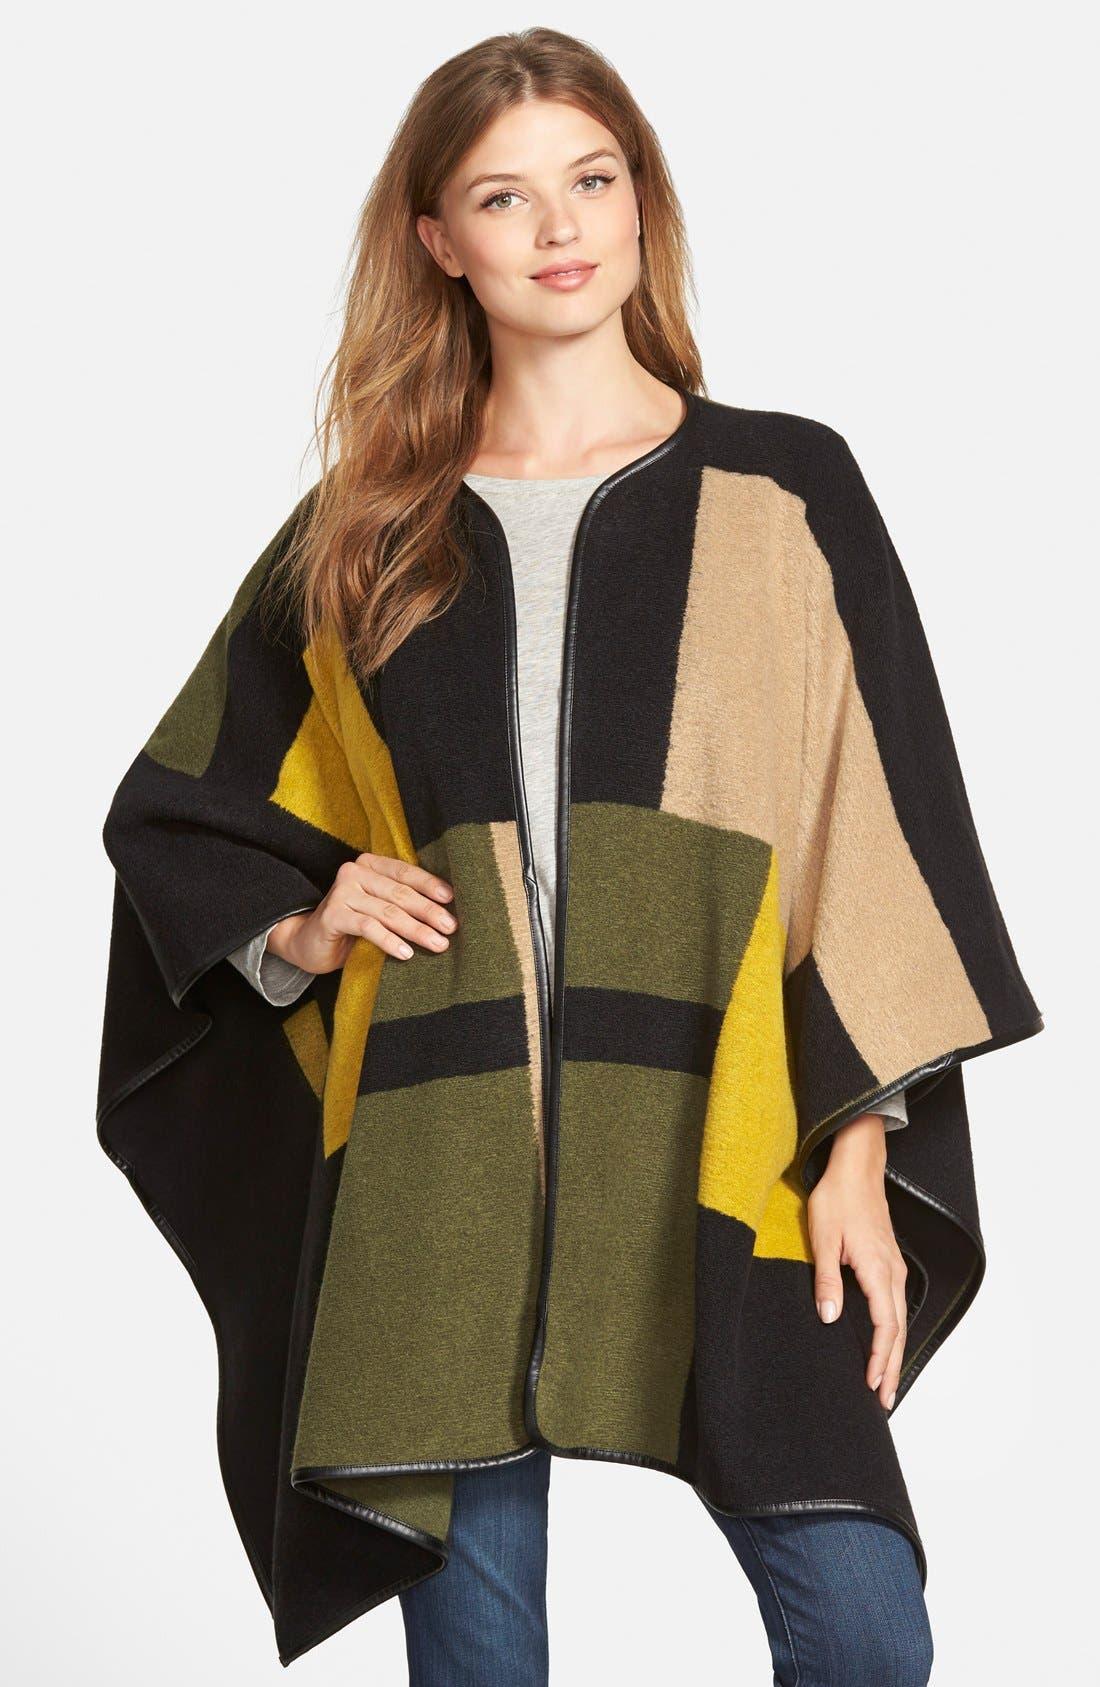 VINCE CAMUTO, Blanket Jacquard Poncho, Main thumbnail 1, color, 342